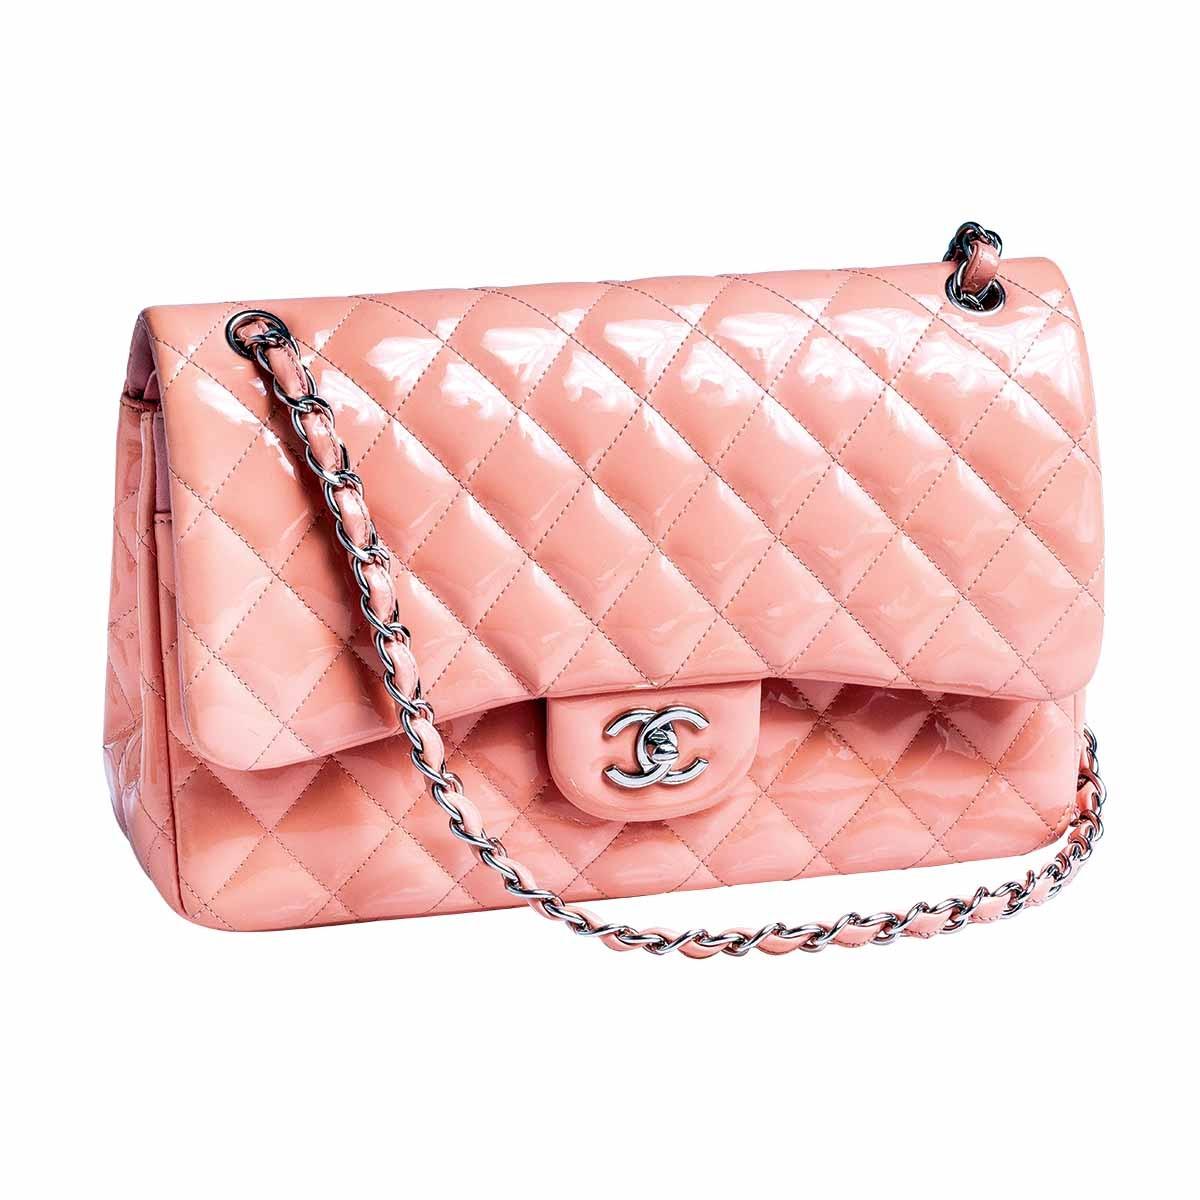 Vintage Chanel Coral Jumbo Double Flap Shoulder Bag